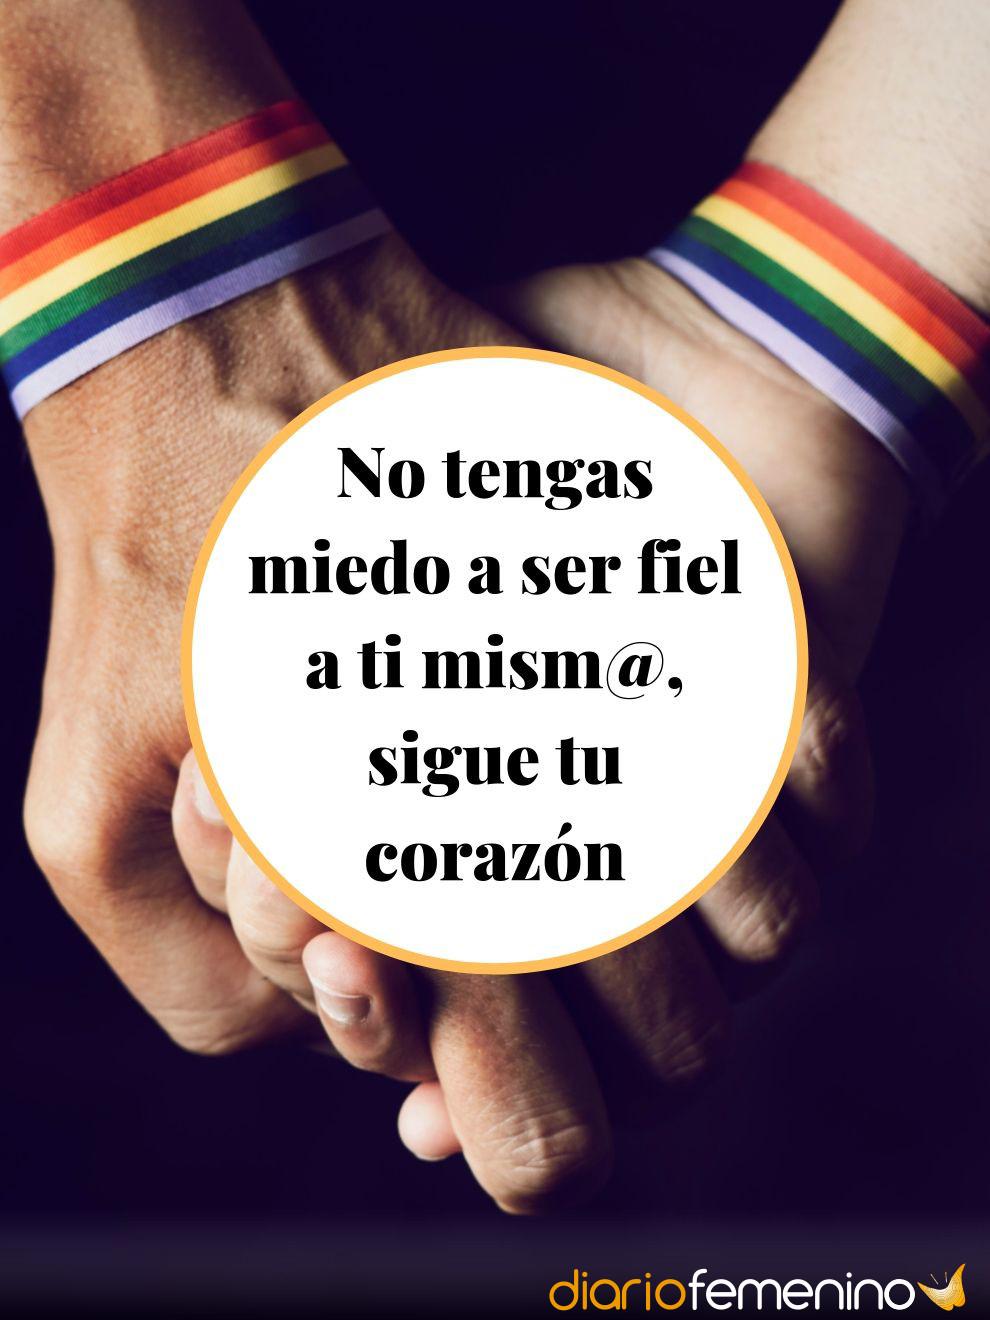 Frases de Orgullo Gay: sé fiel a tu corazón